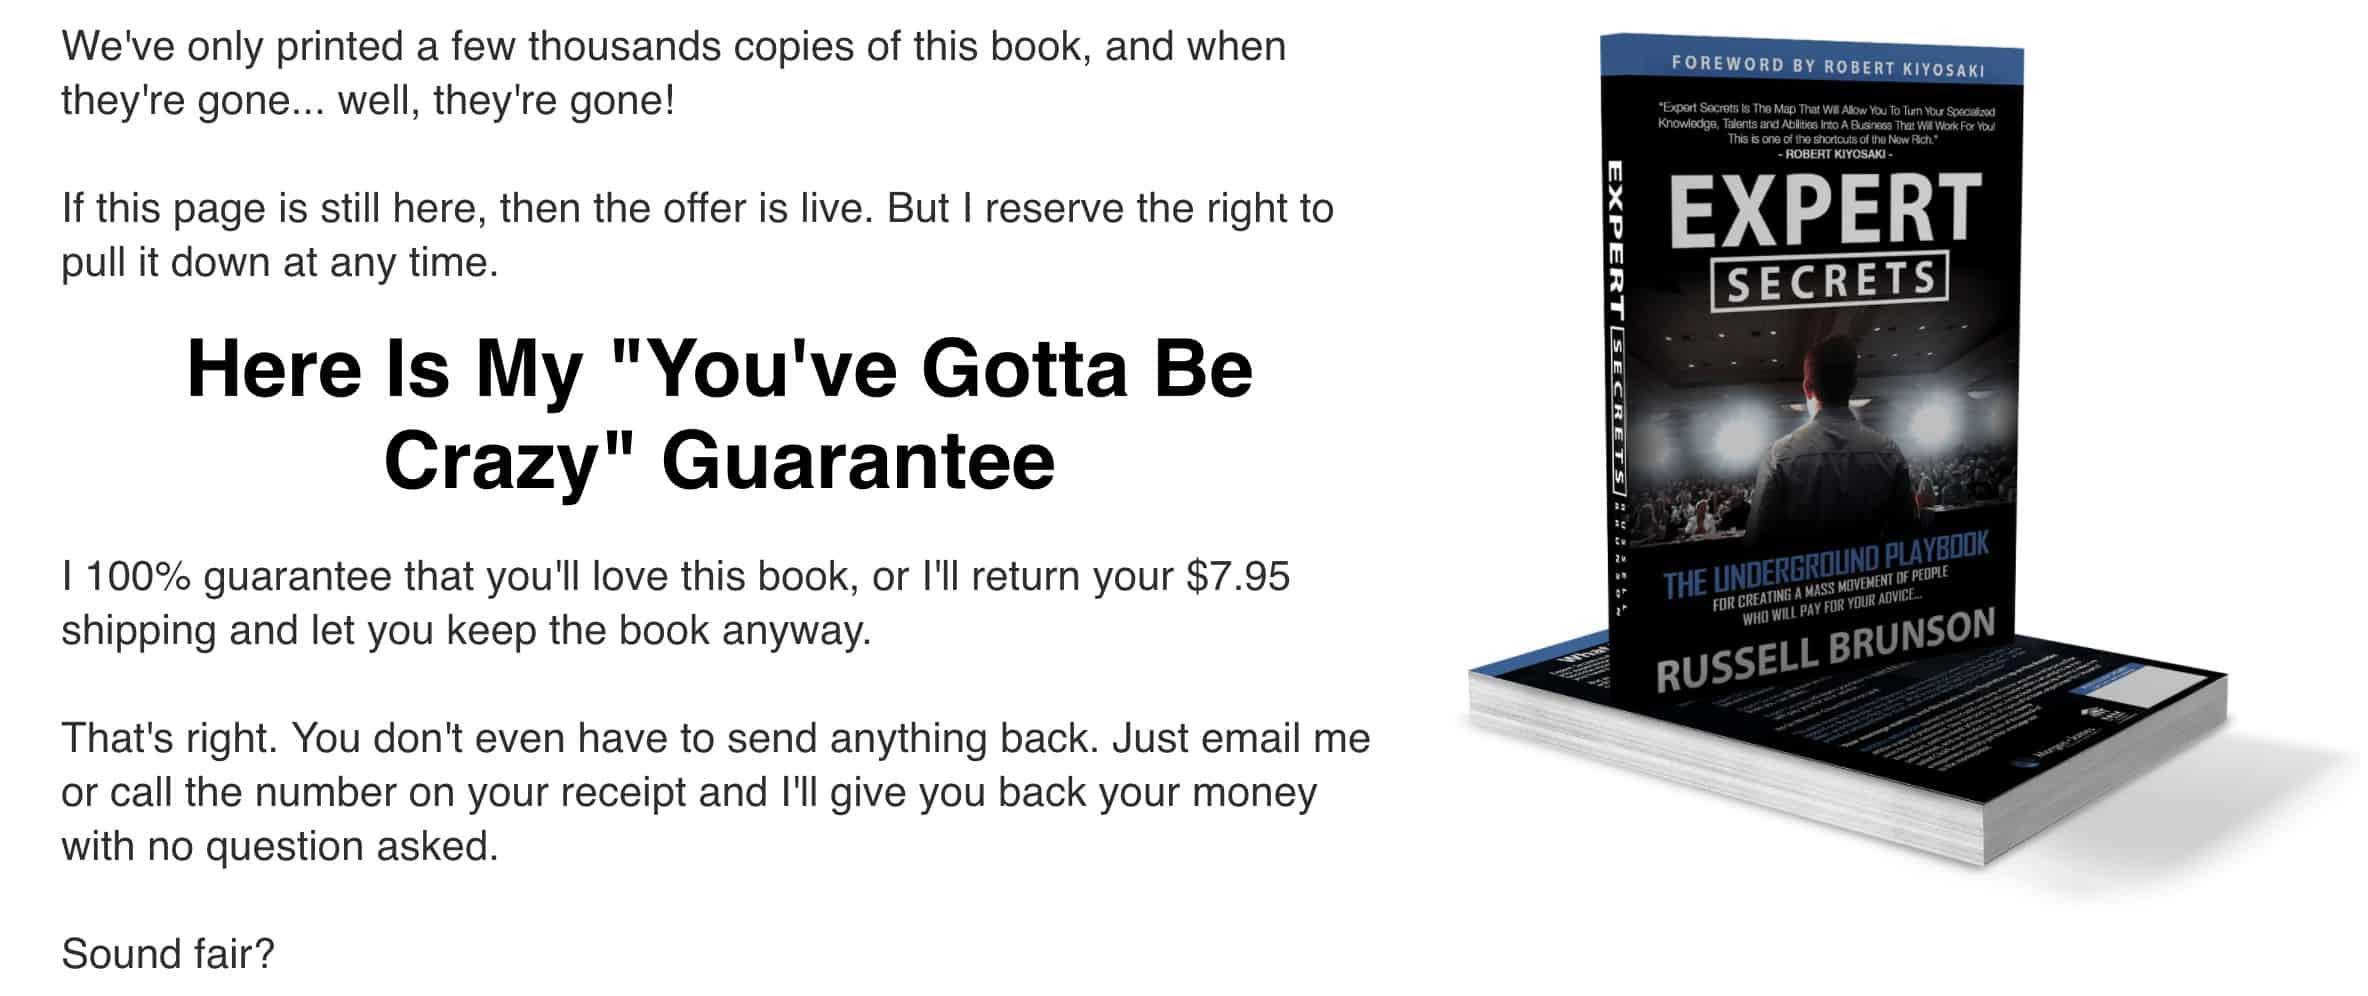 Expert Secrets Money Back Guarantee